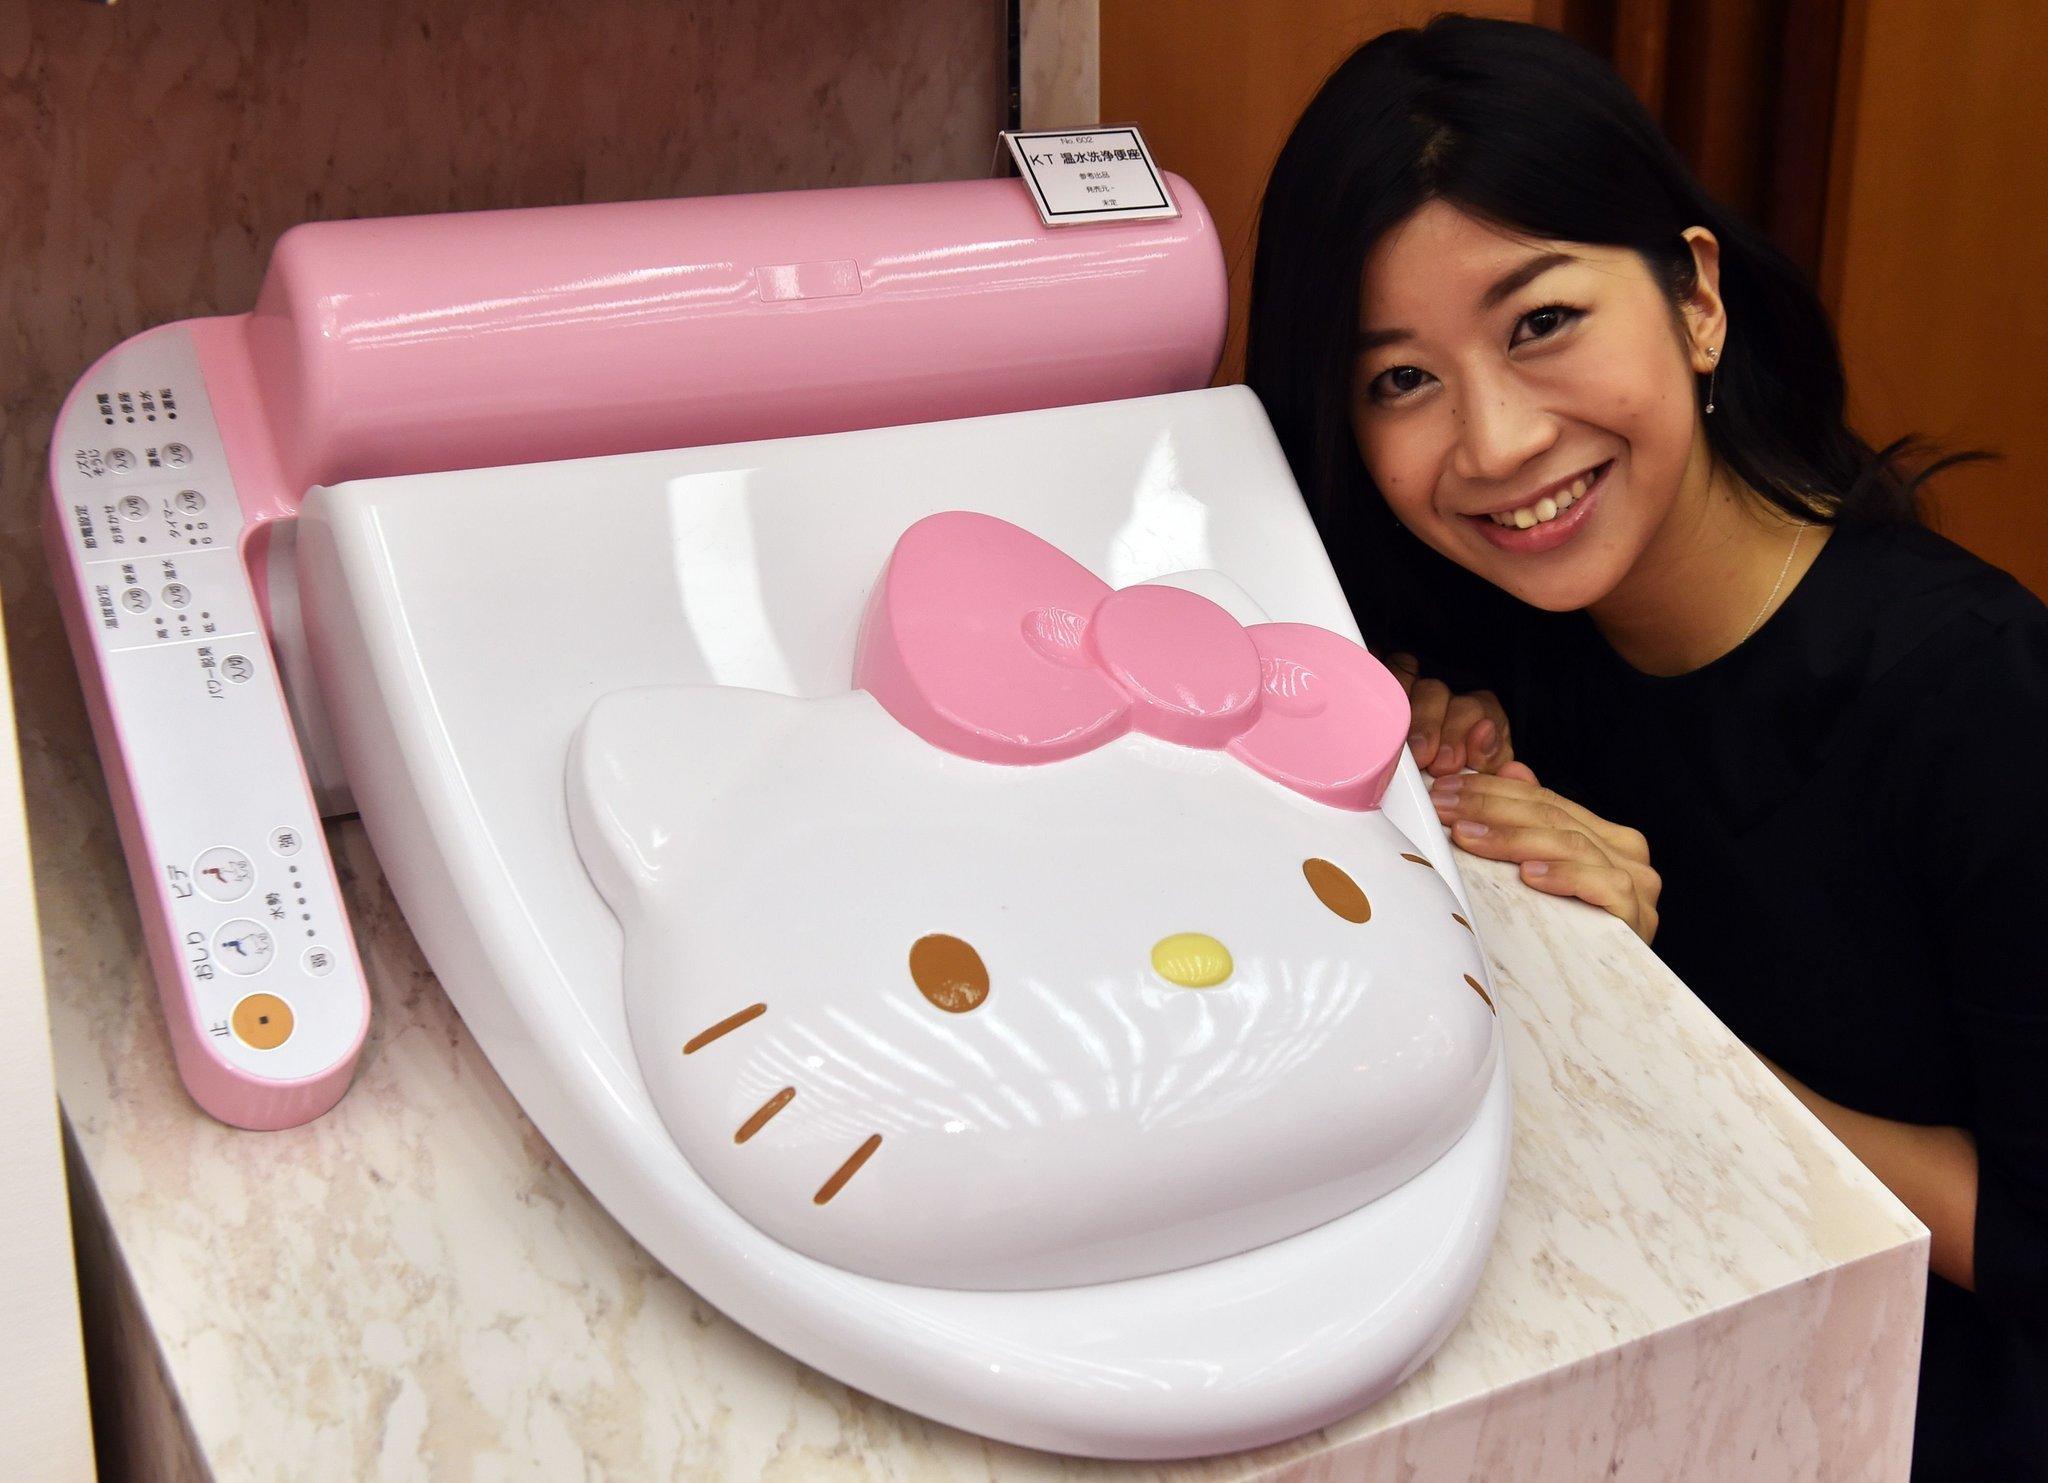 Chinese Media Pooh Pooh Shoppers Embrace Of Japanese